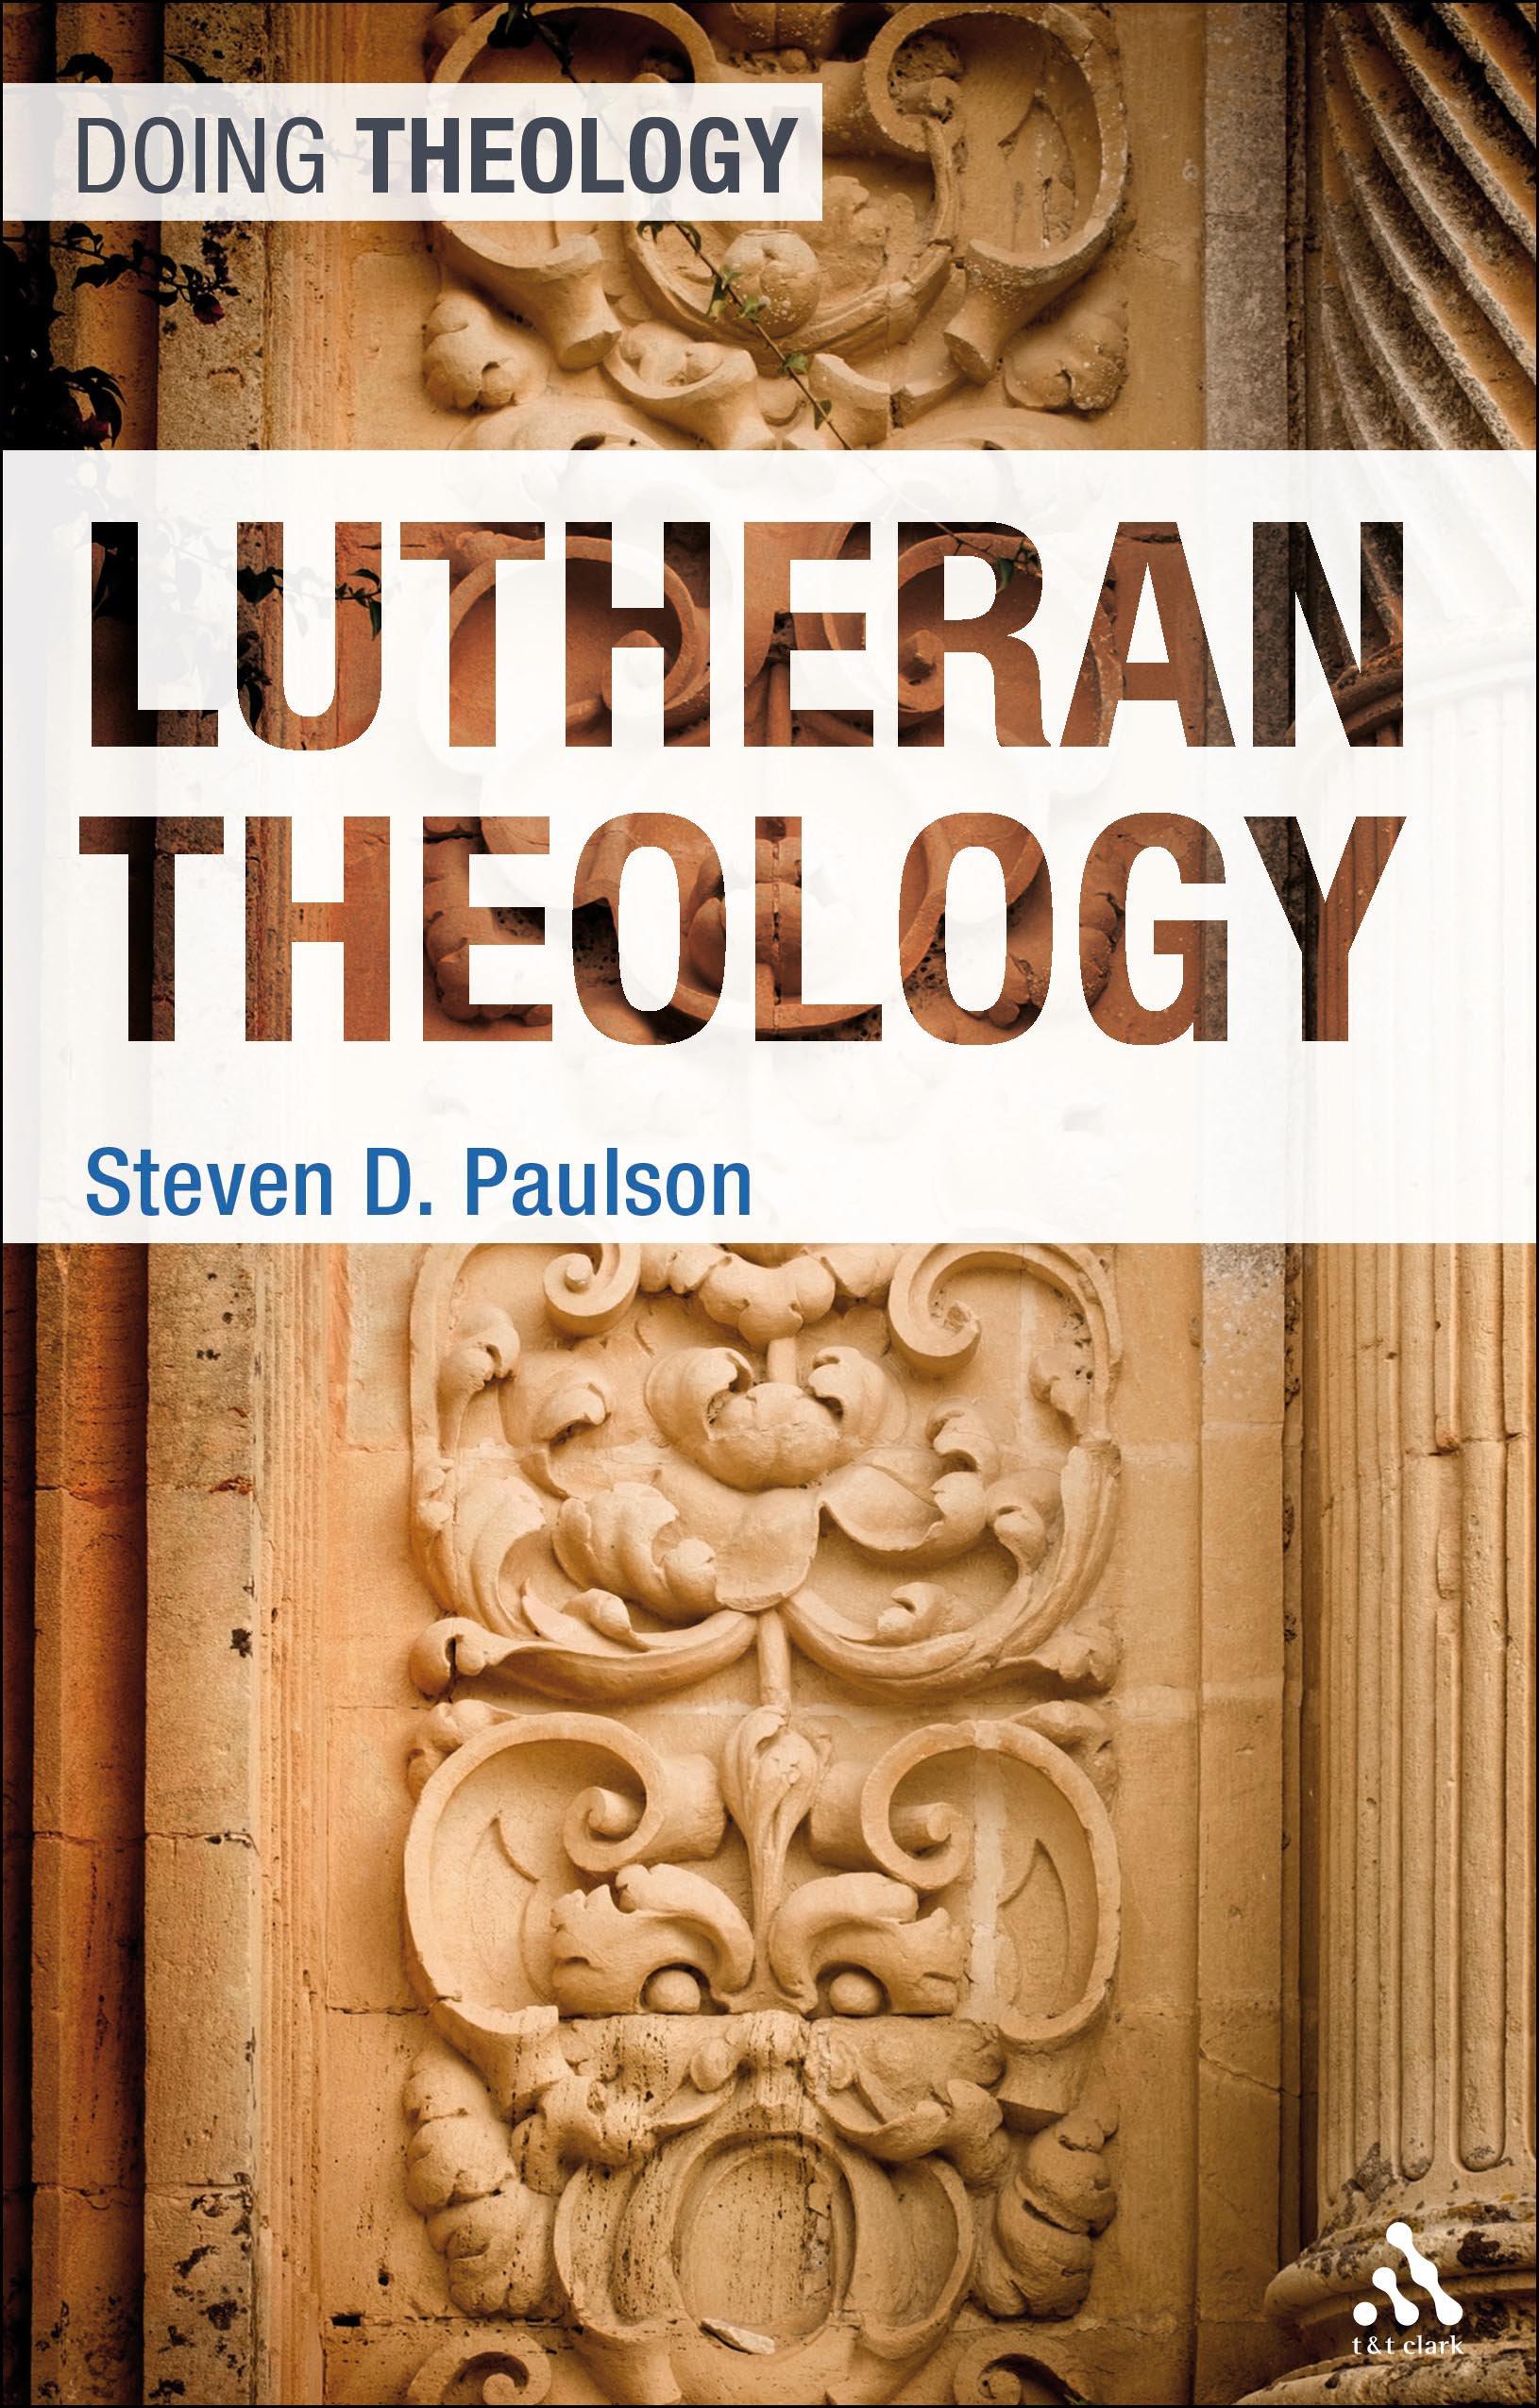 Paulson_Lutheran_Theology_Cover_Image.jpg